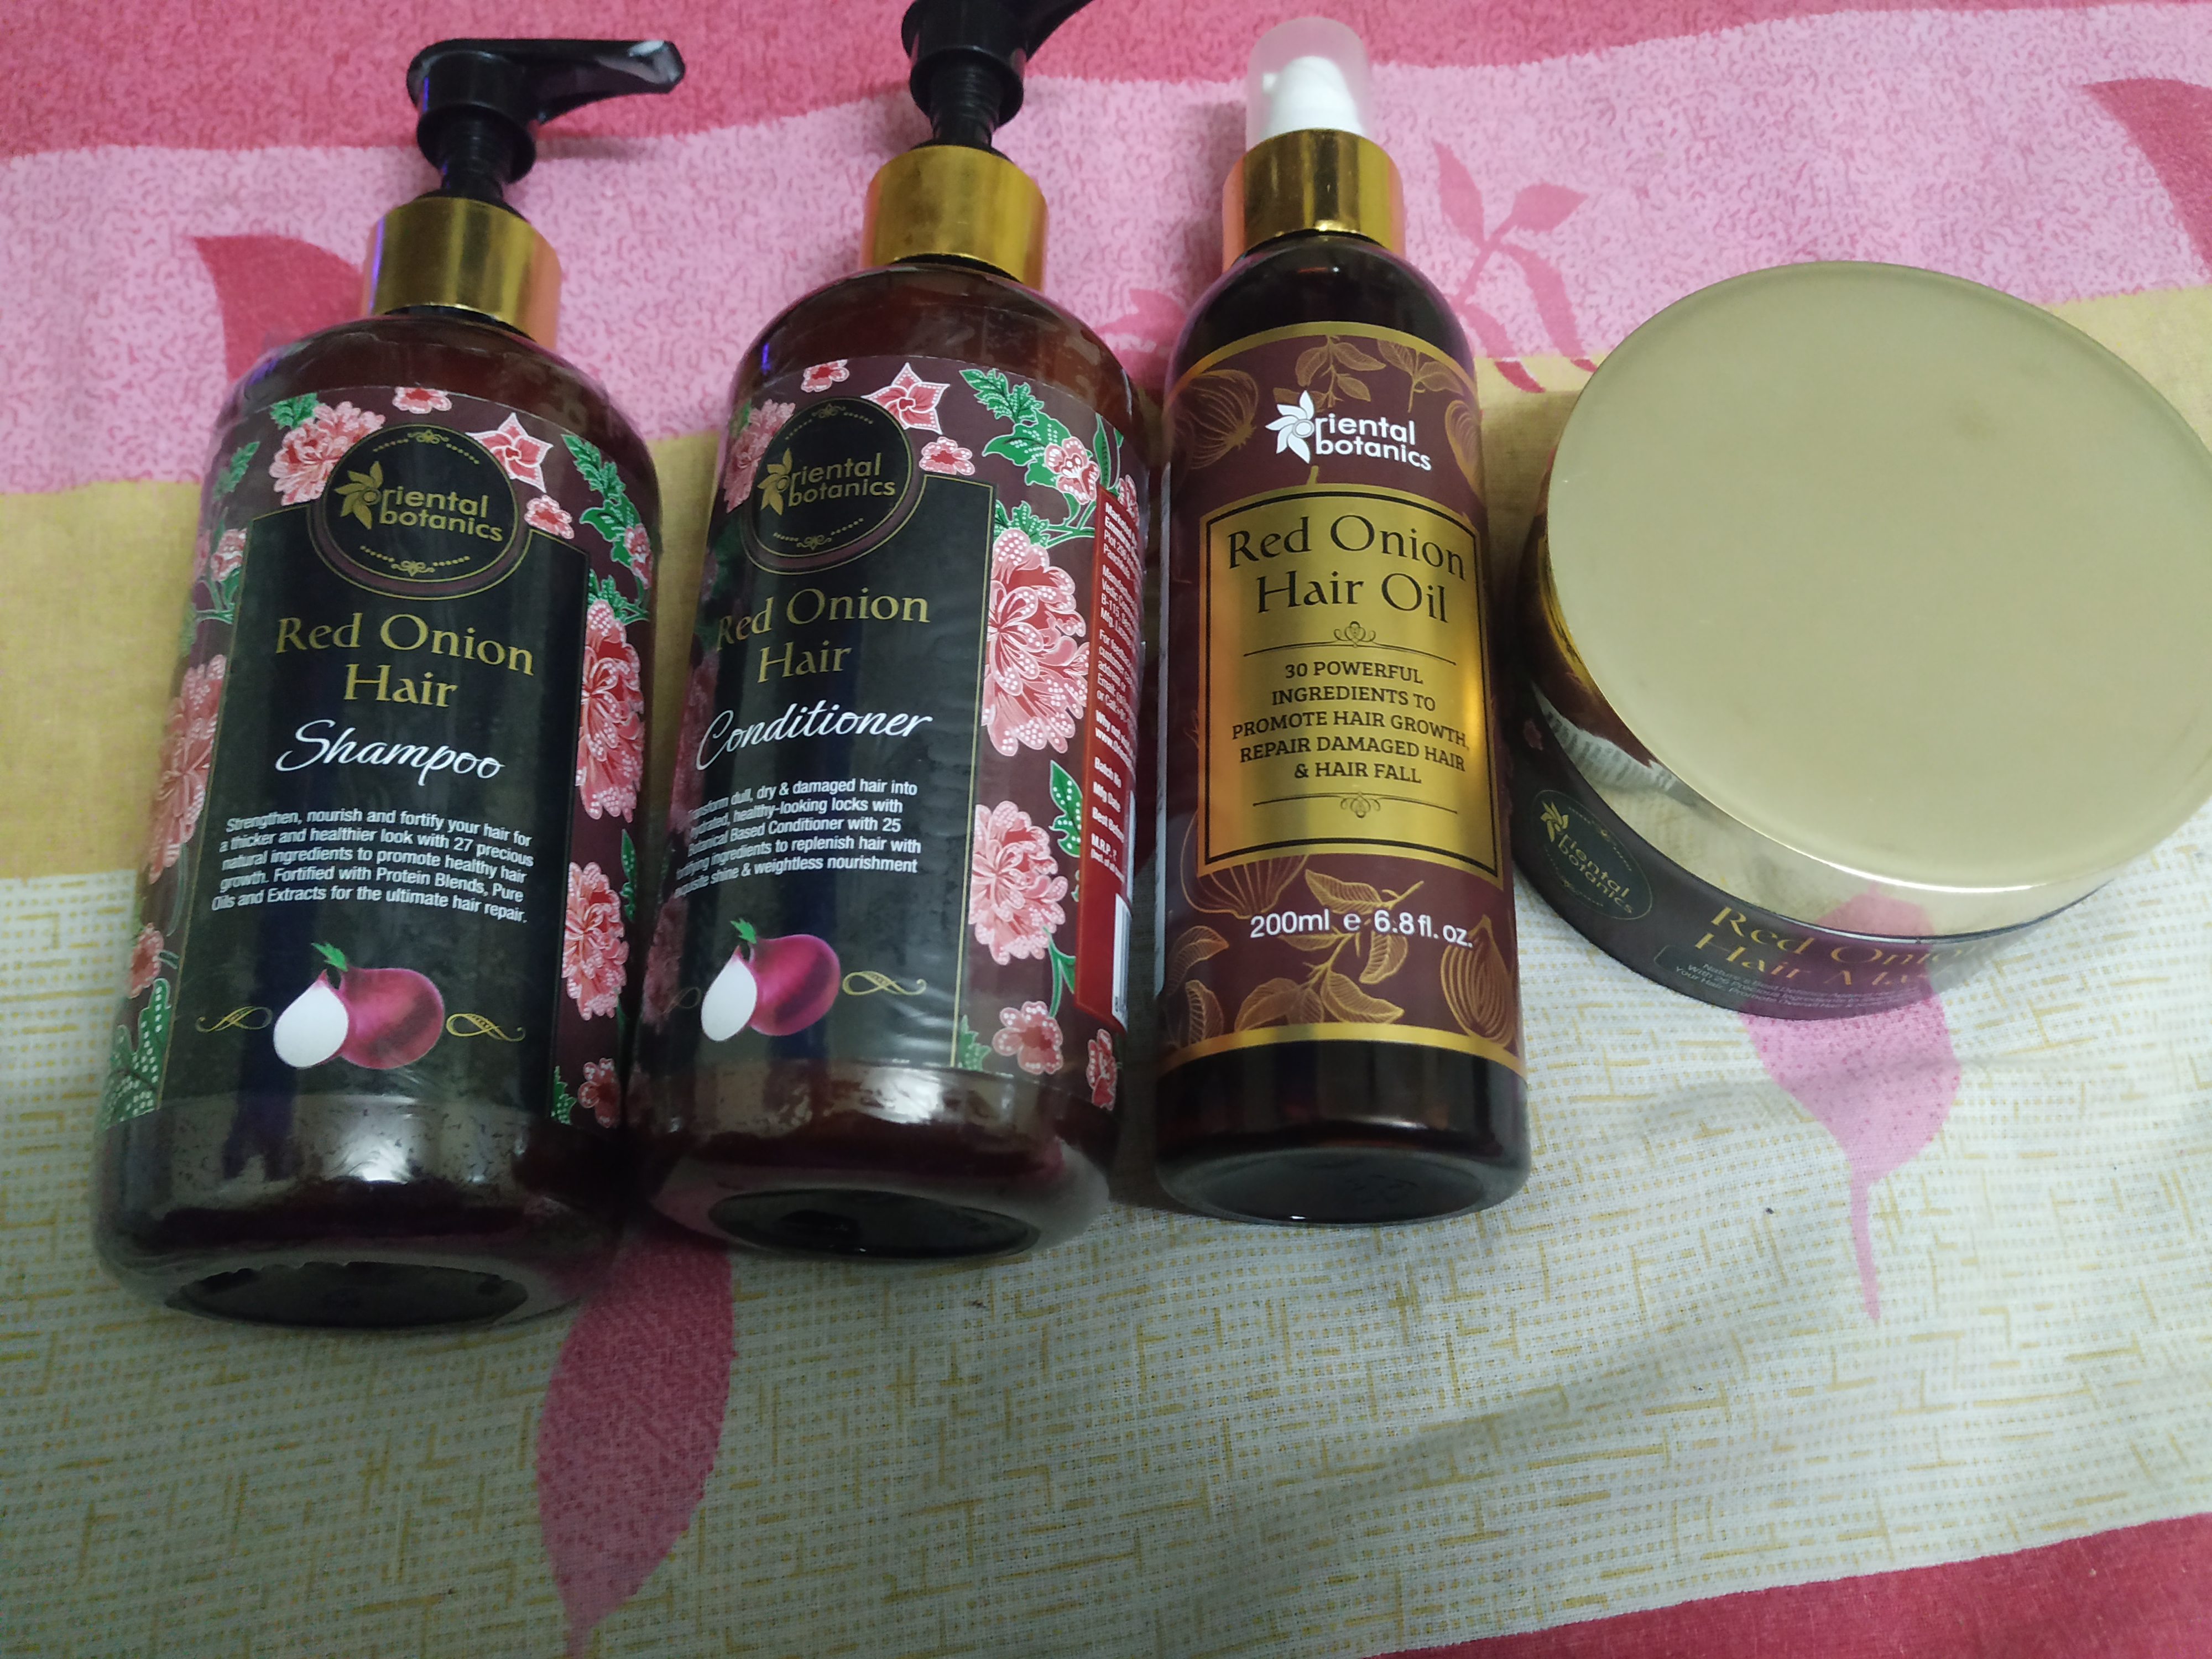 Oriental Botanics Red Onion Hair Shampoo + Conditioner + Oil -Best red onion hair care kit so far-By rita_punjabi